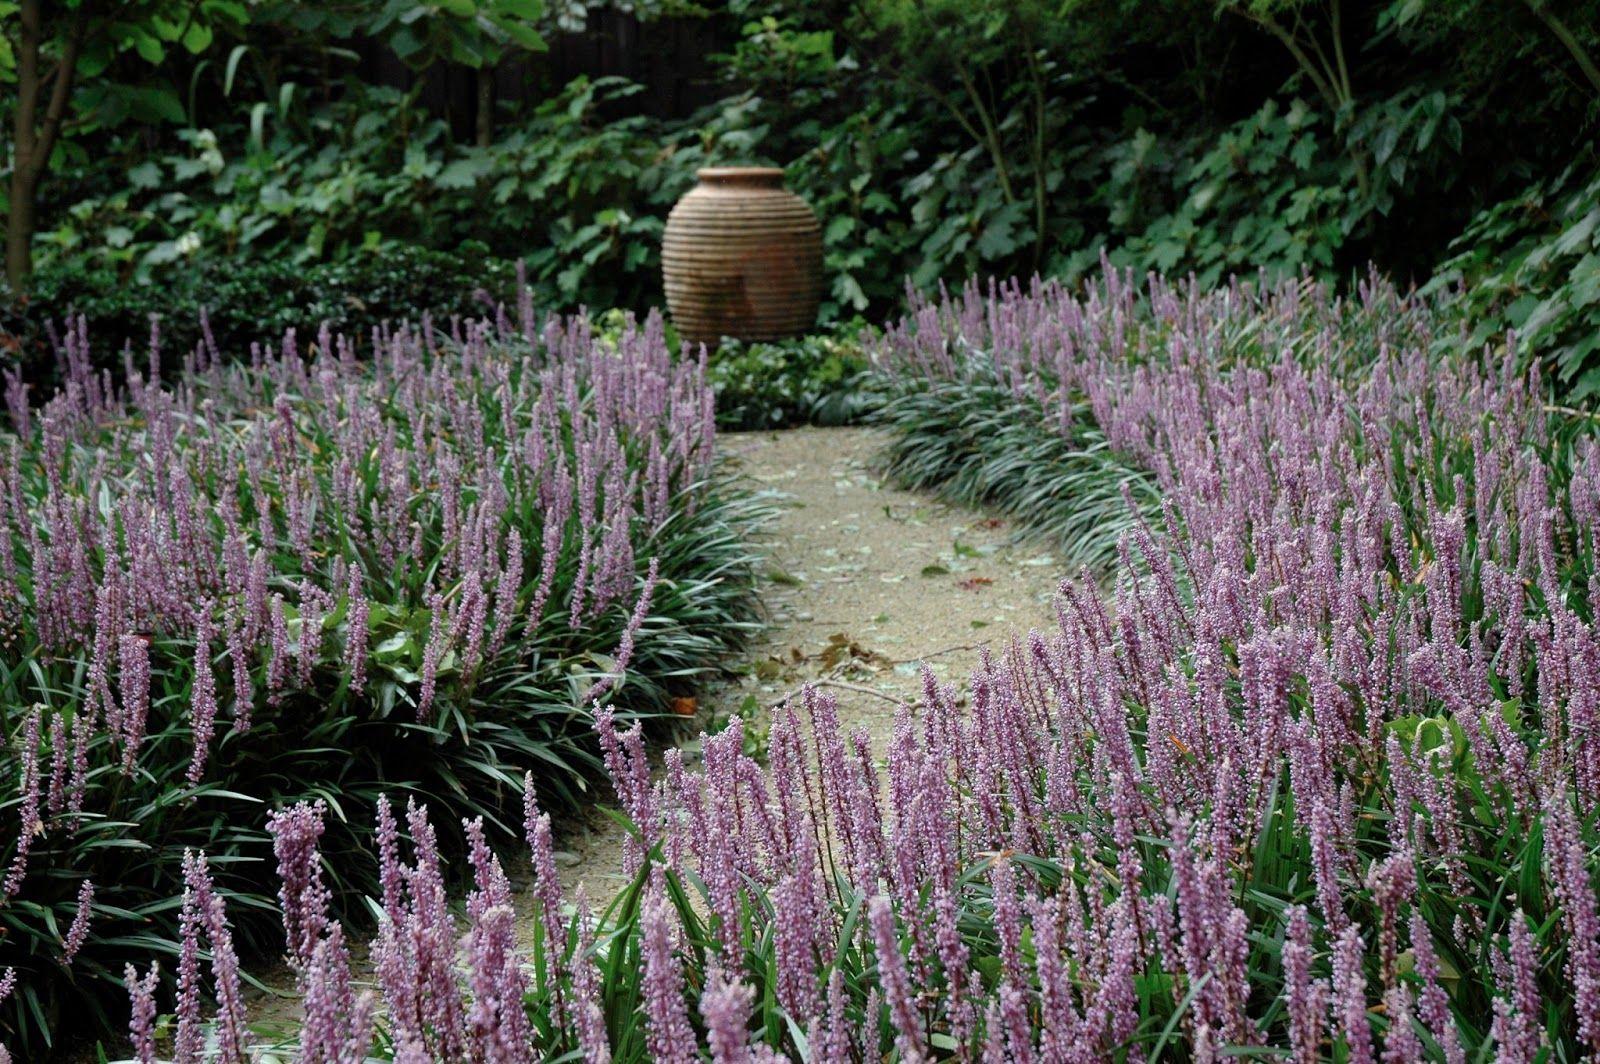 Liriope+gigantea+Lilyturf.JPG (1600×1064) | Plants I want ...